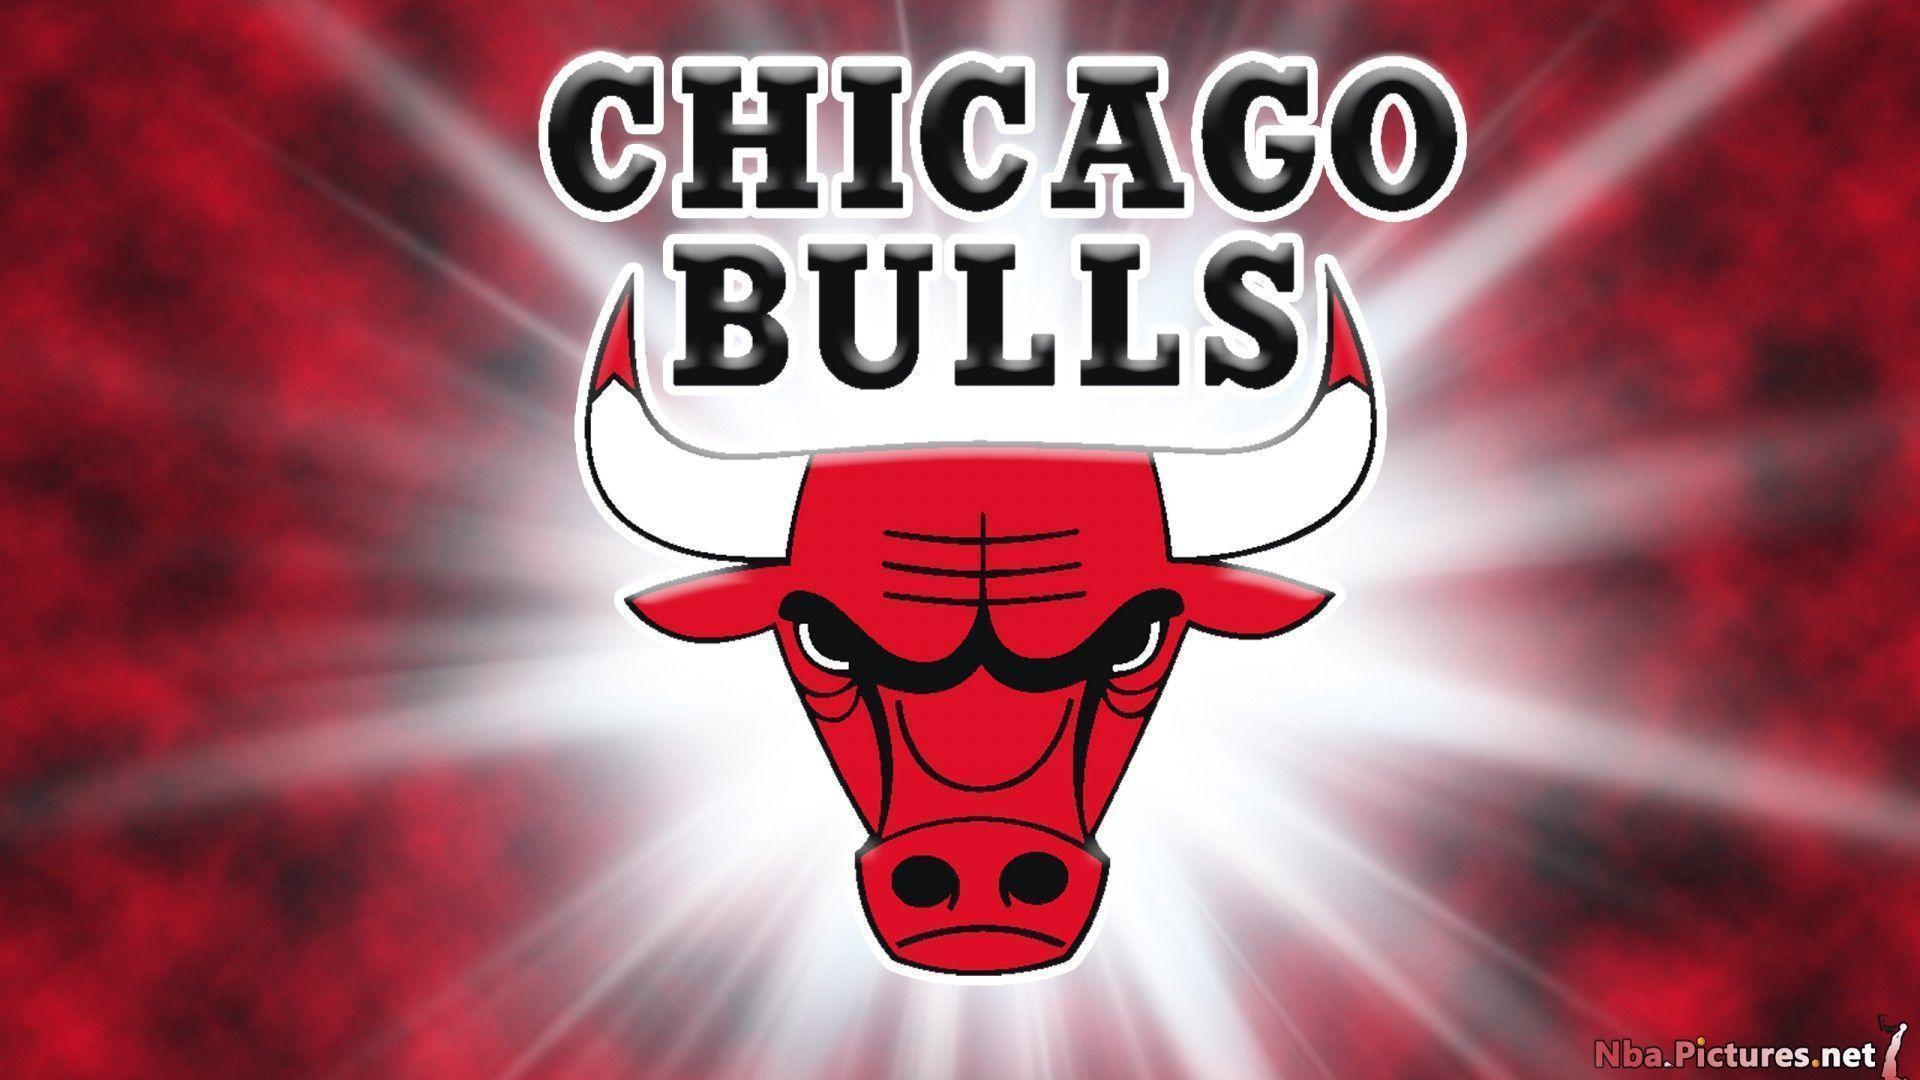 Chicago Bulls Logo 27 Backgrounds | Wallruru.